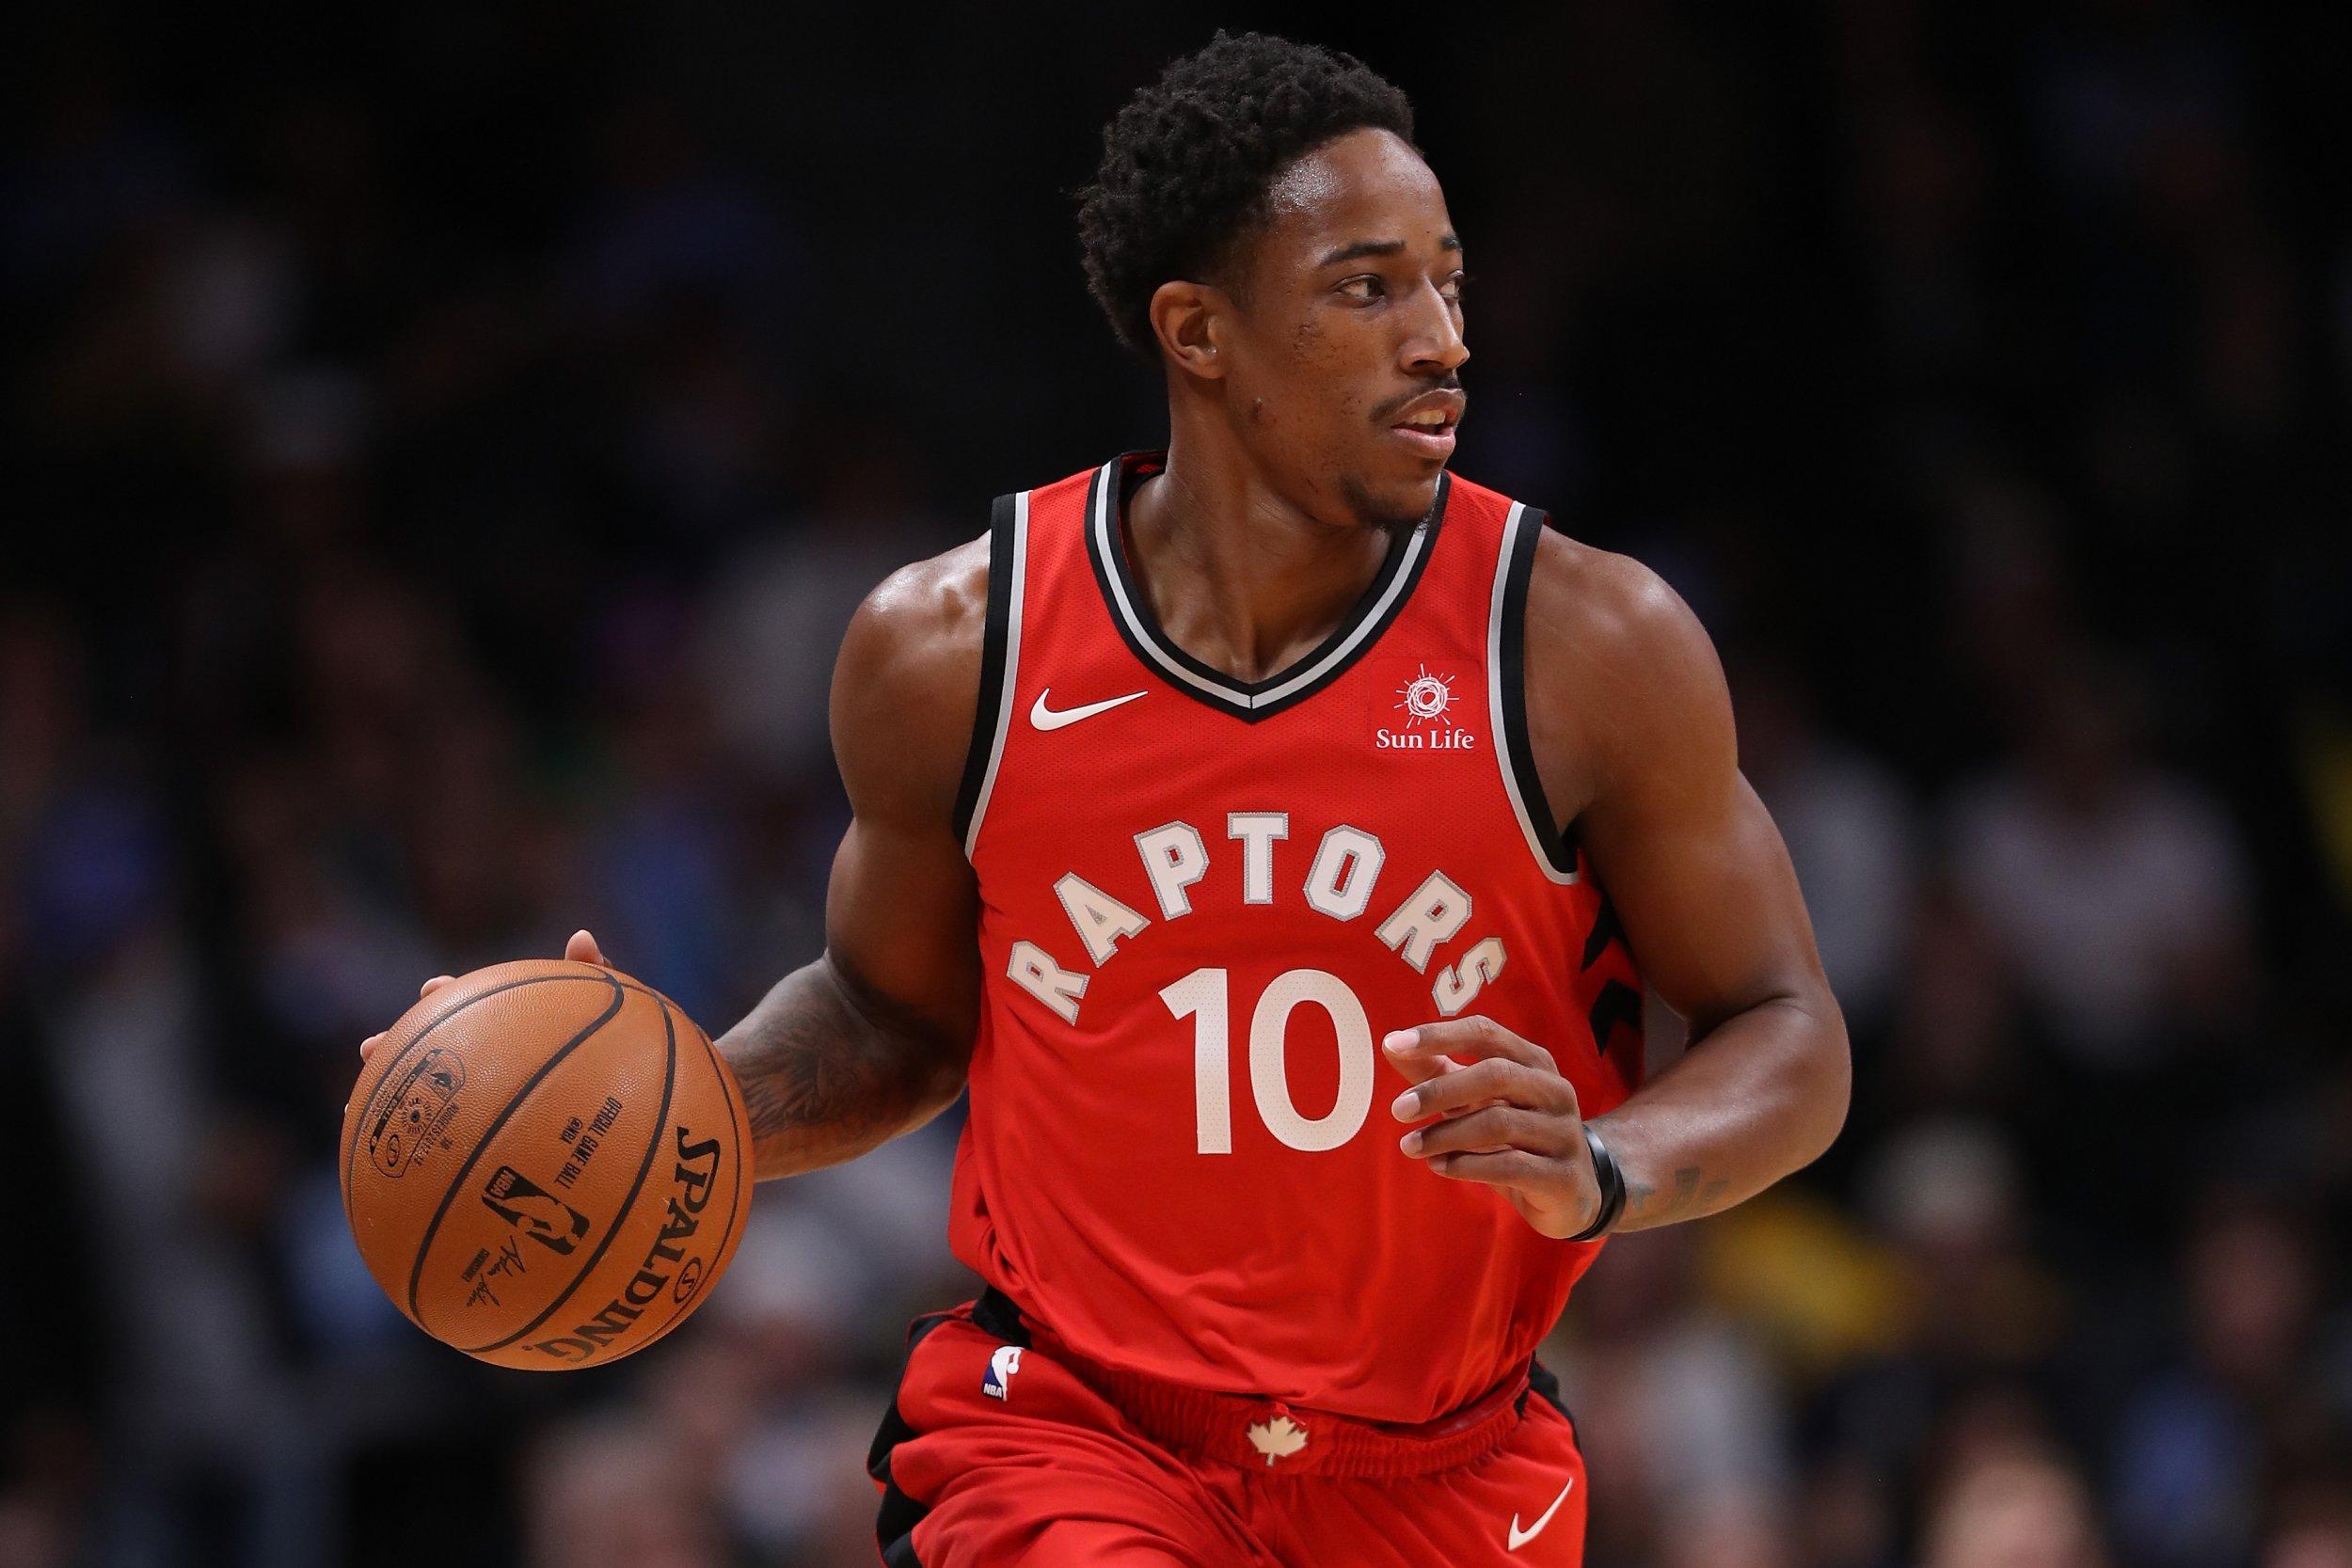 Toronto Raptors shooting guard DeMar DeRozan.